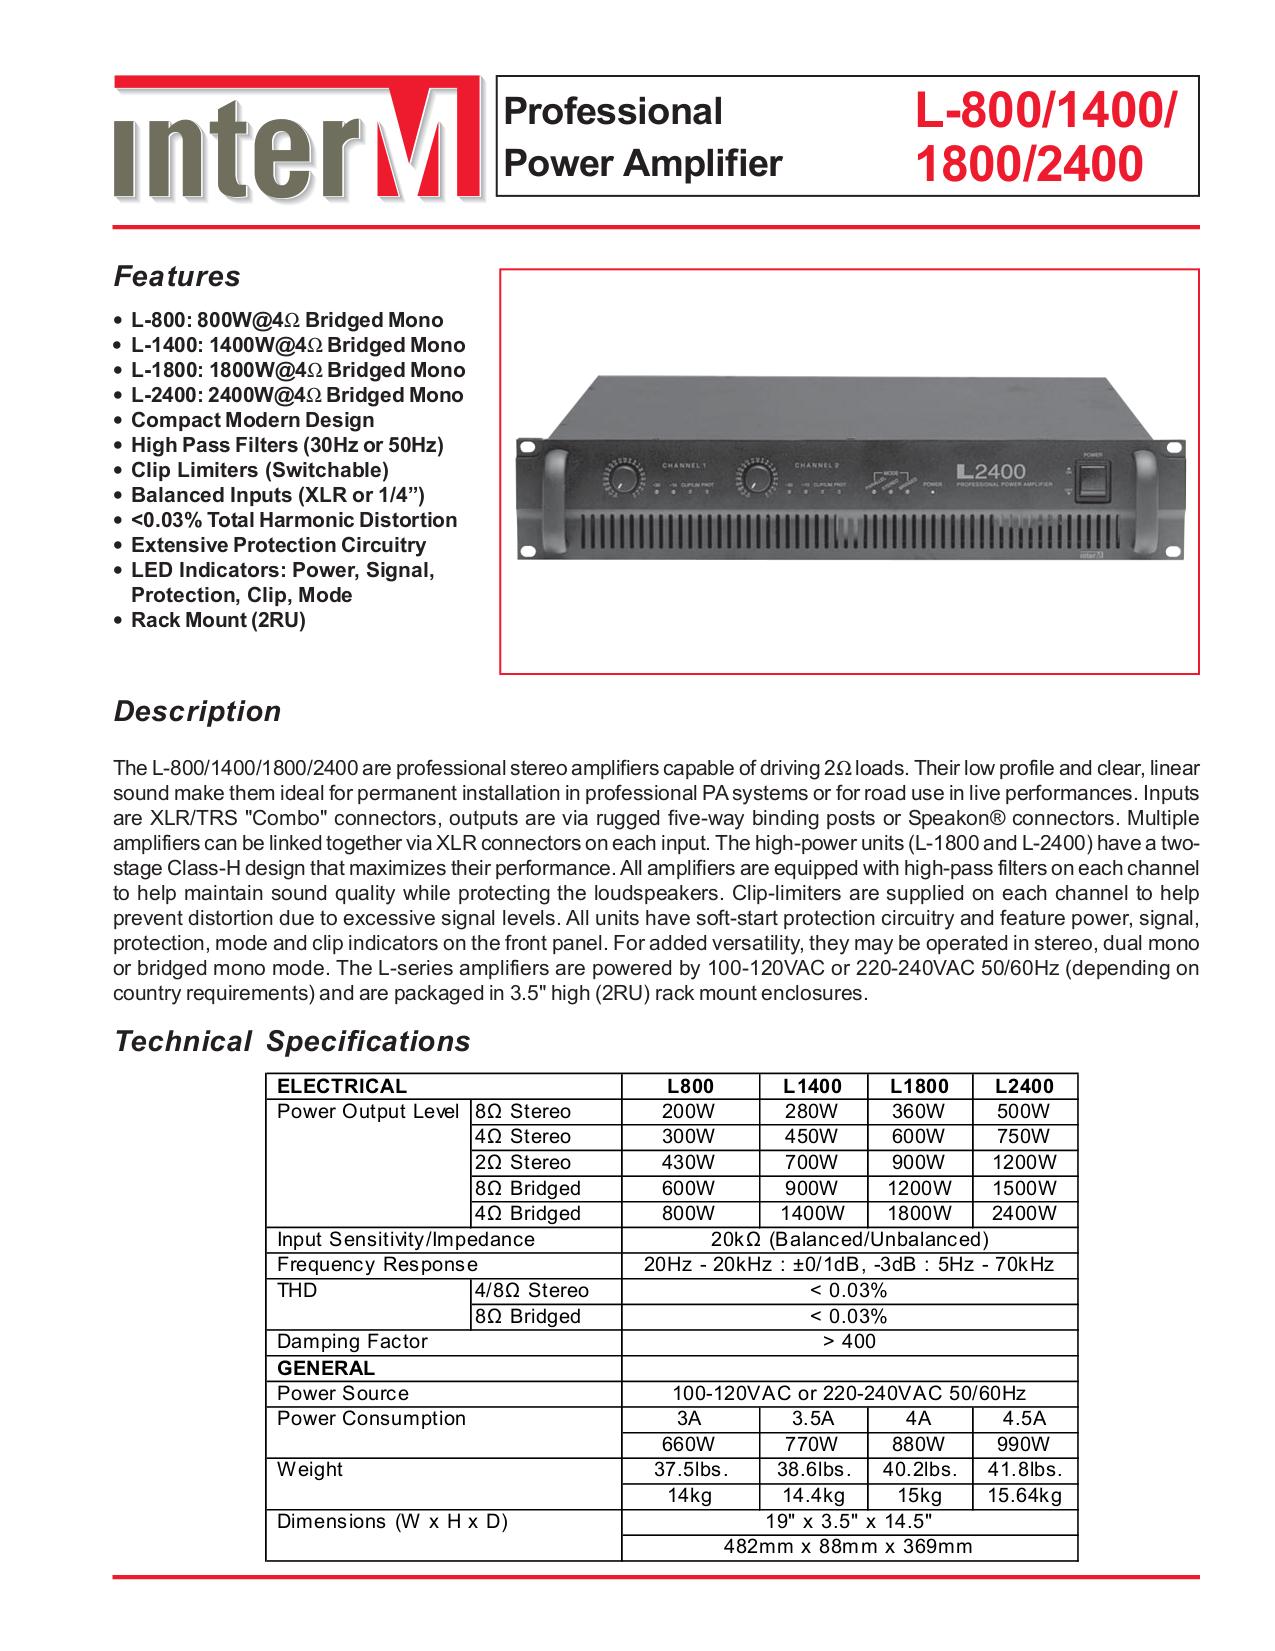 pdf for Inter-m Amp L-1400 manual